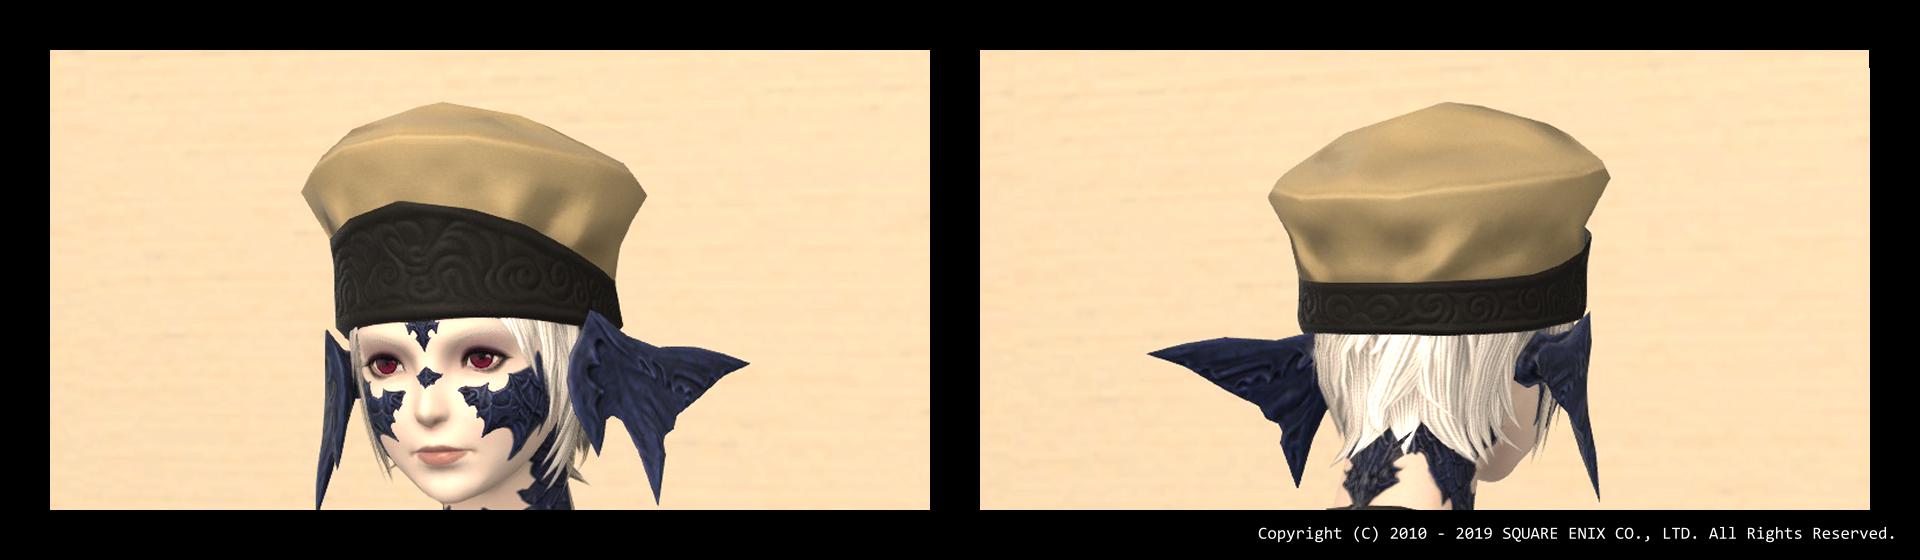 395c-whmschast-head